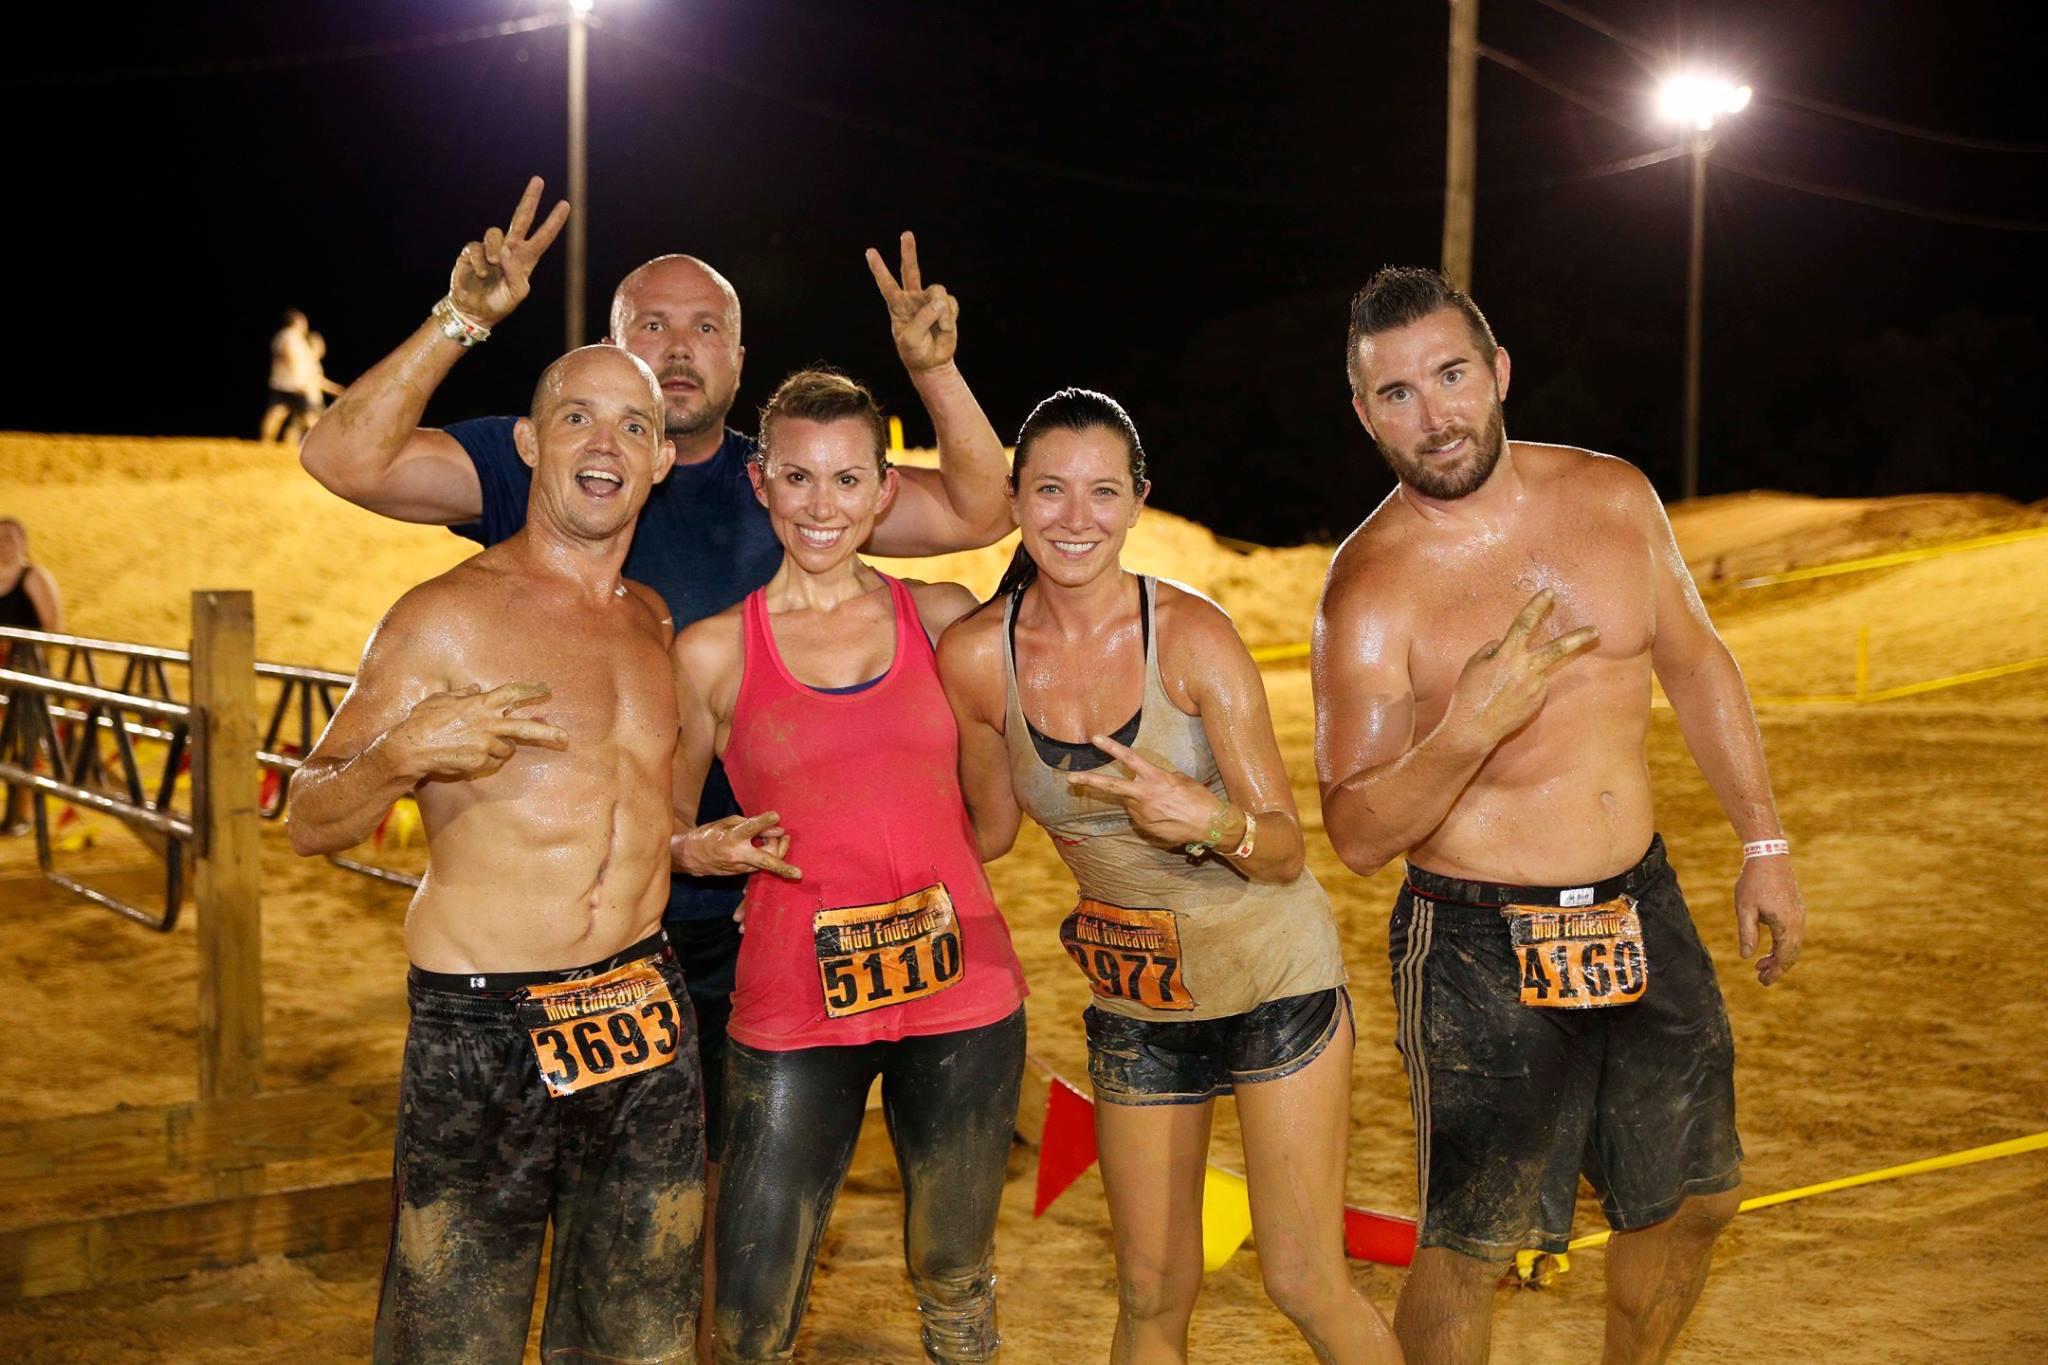 Mud Endeavor - Under the Lights - Athletes